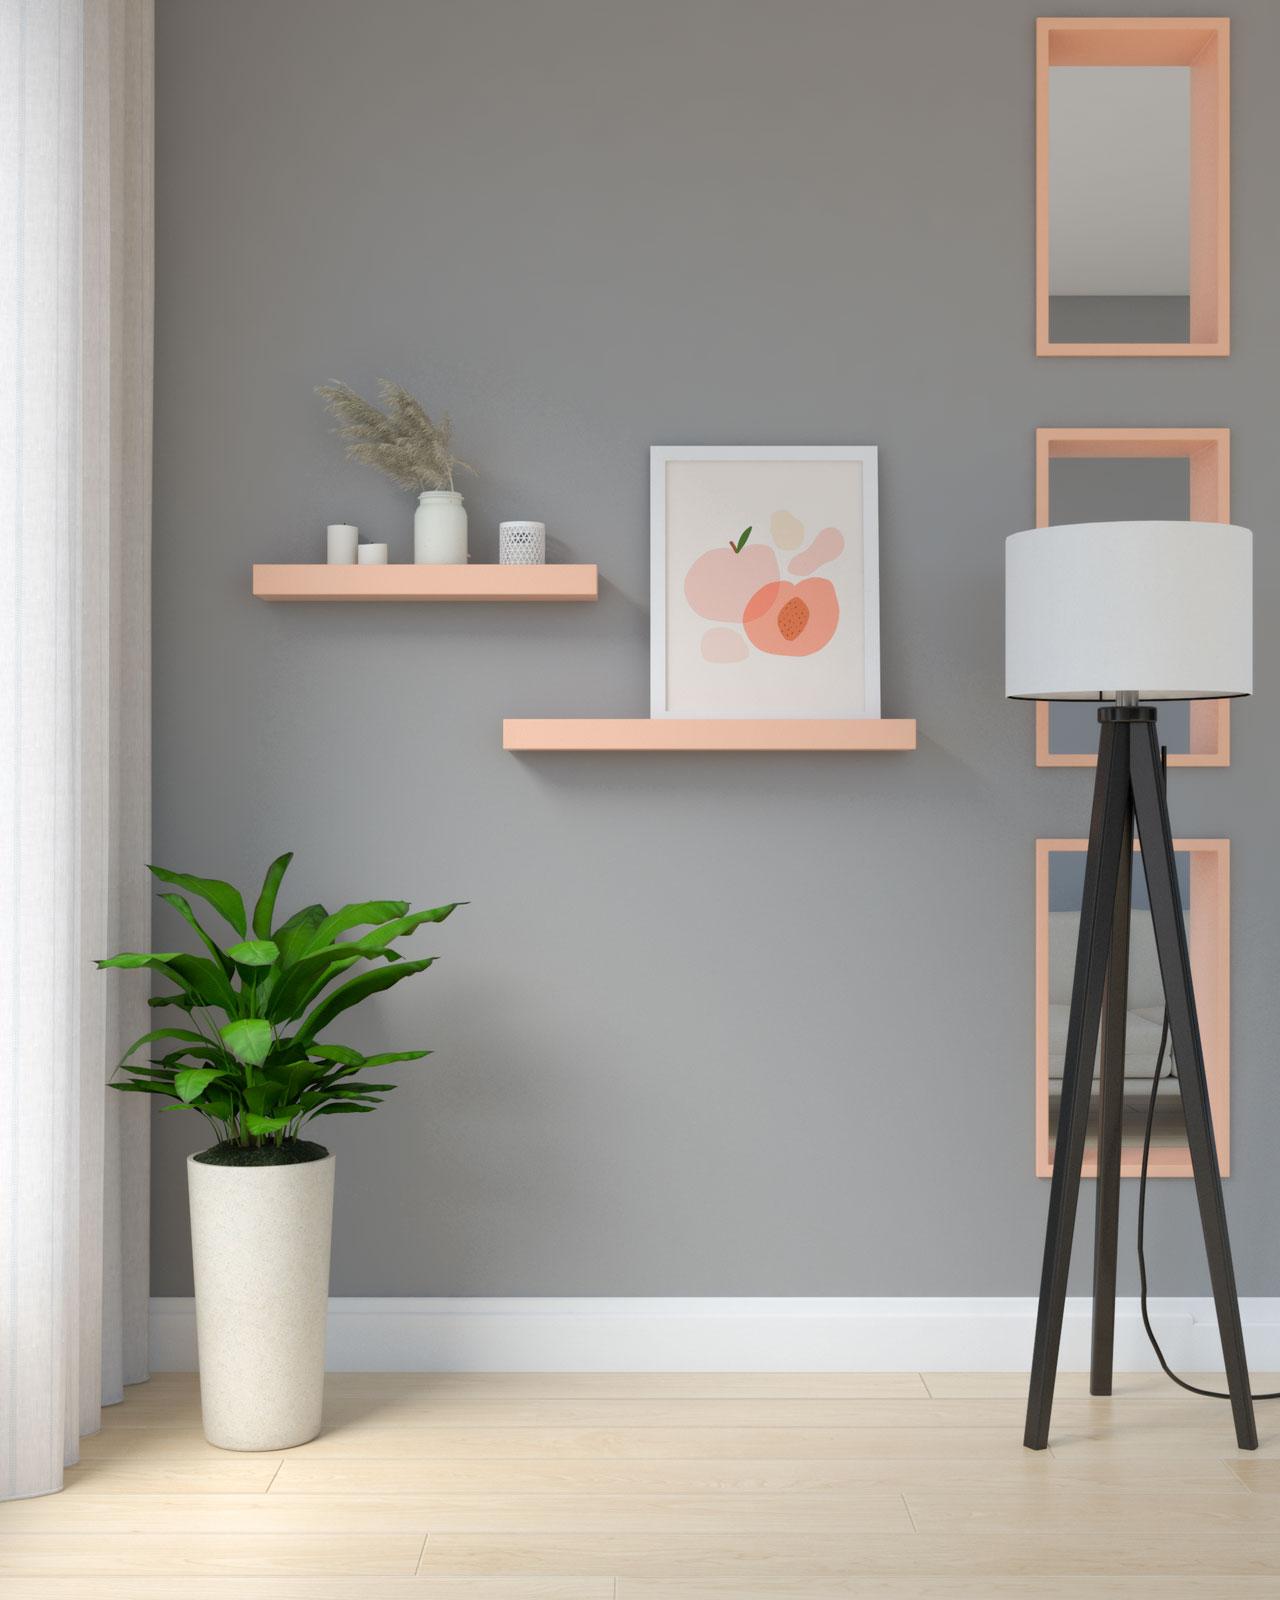 Pink flamingo shelves on gray wall